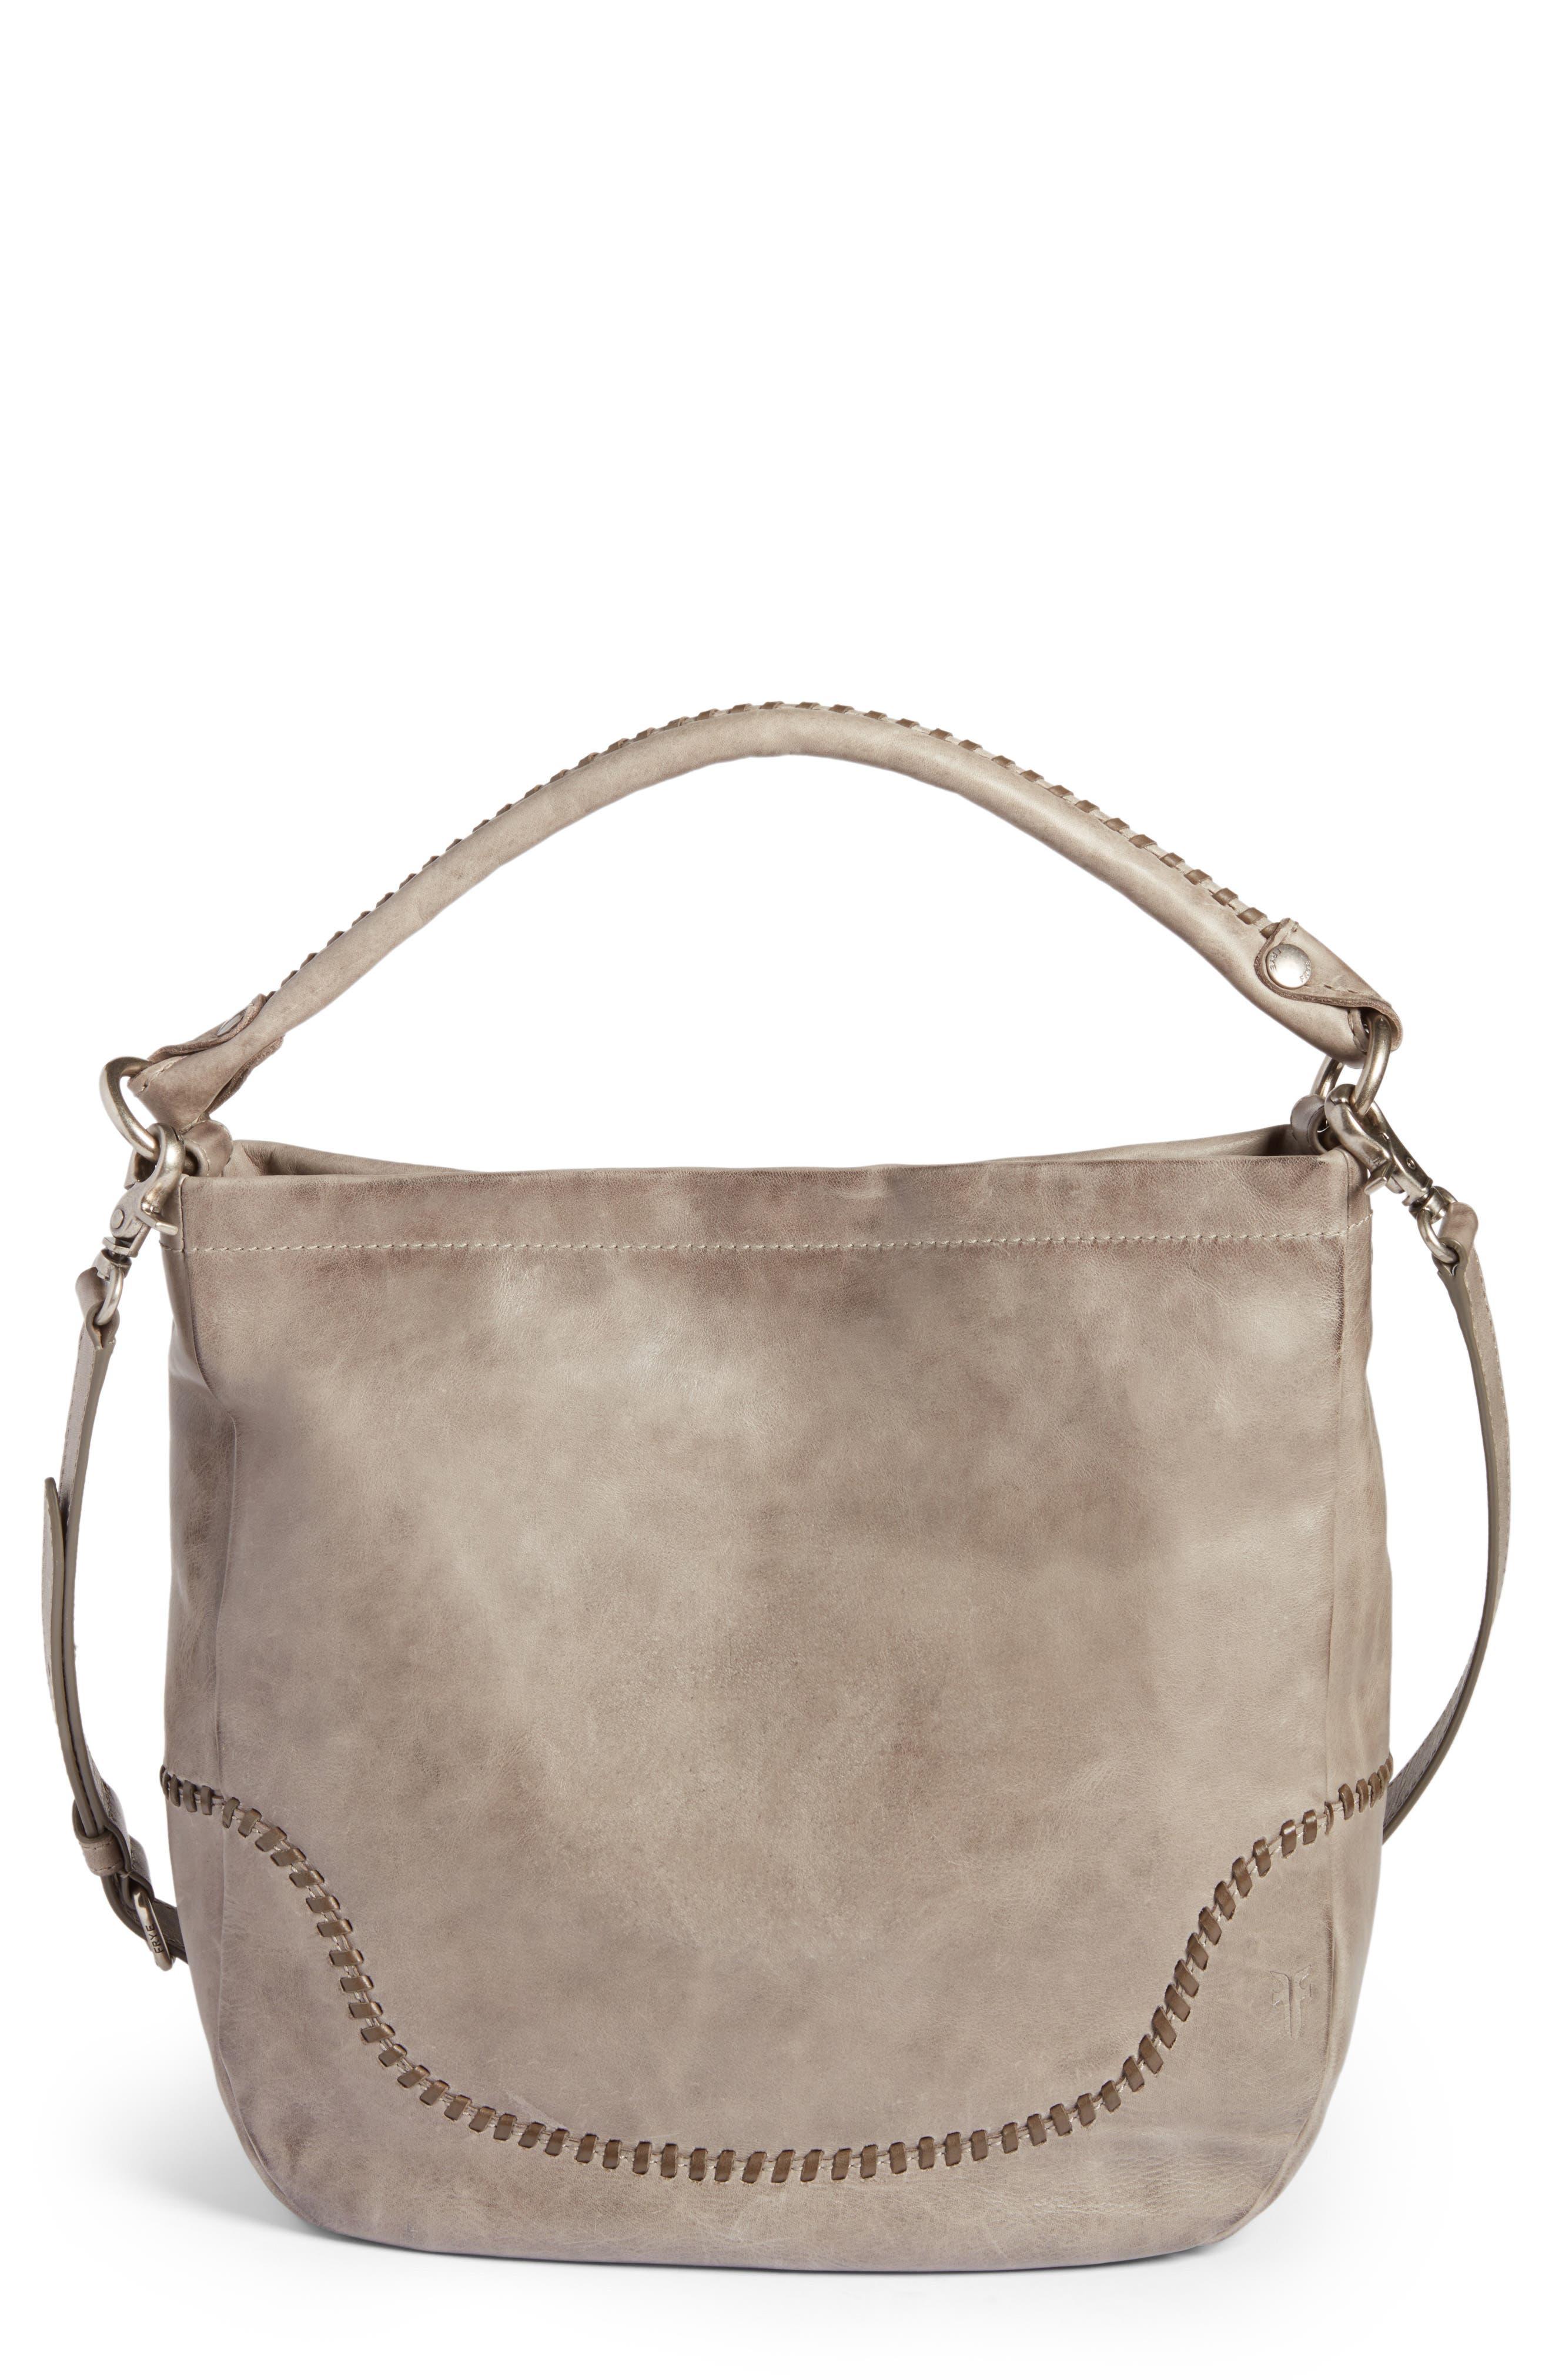 Frye Melissa Whipstitch Leather Hobo